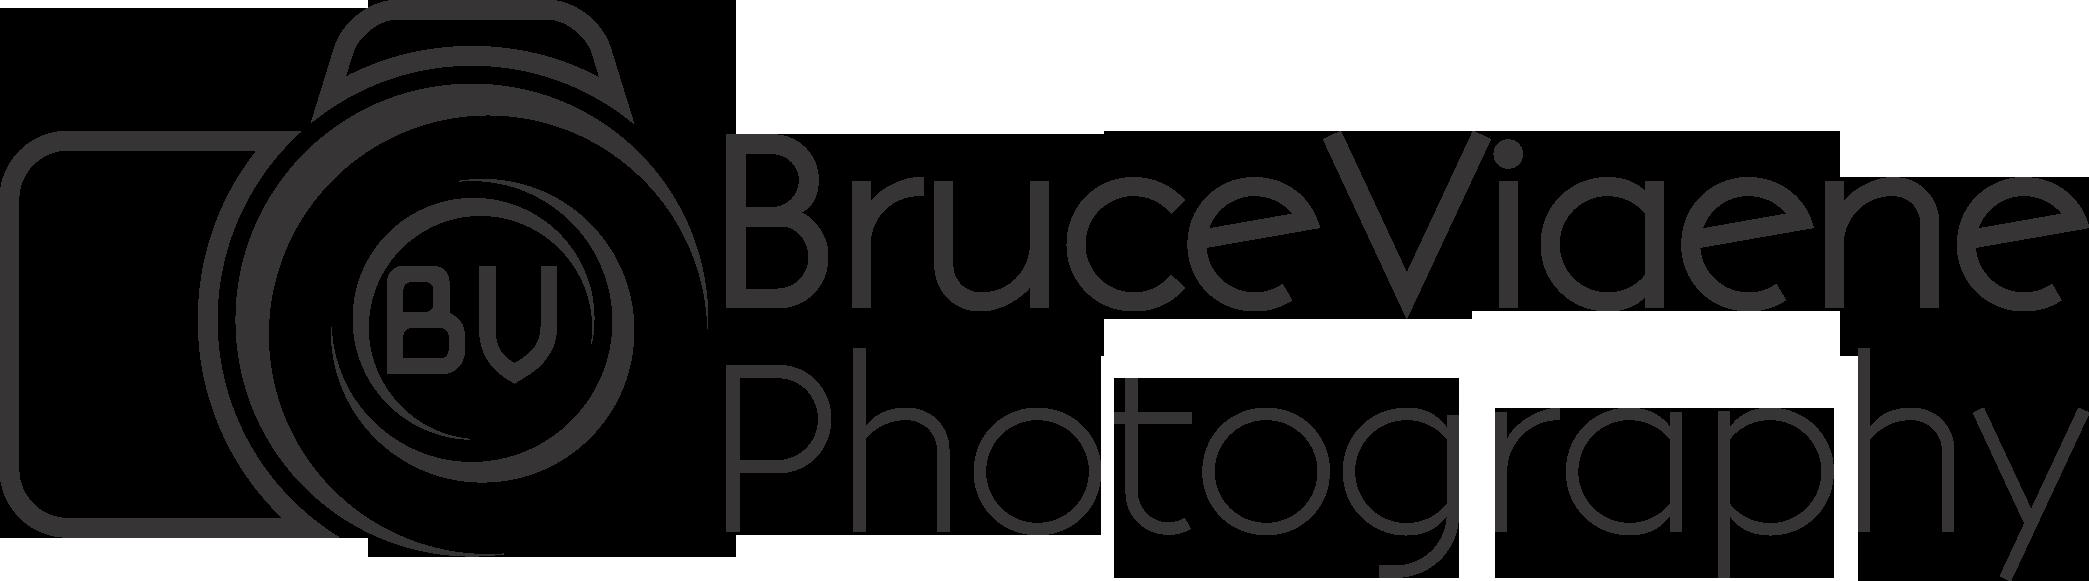 Bruce Viaene Photography